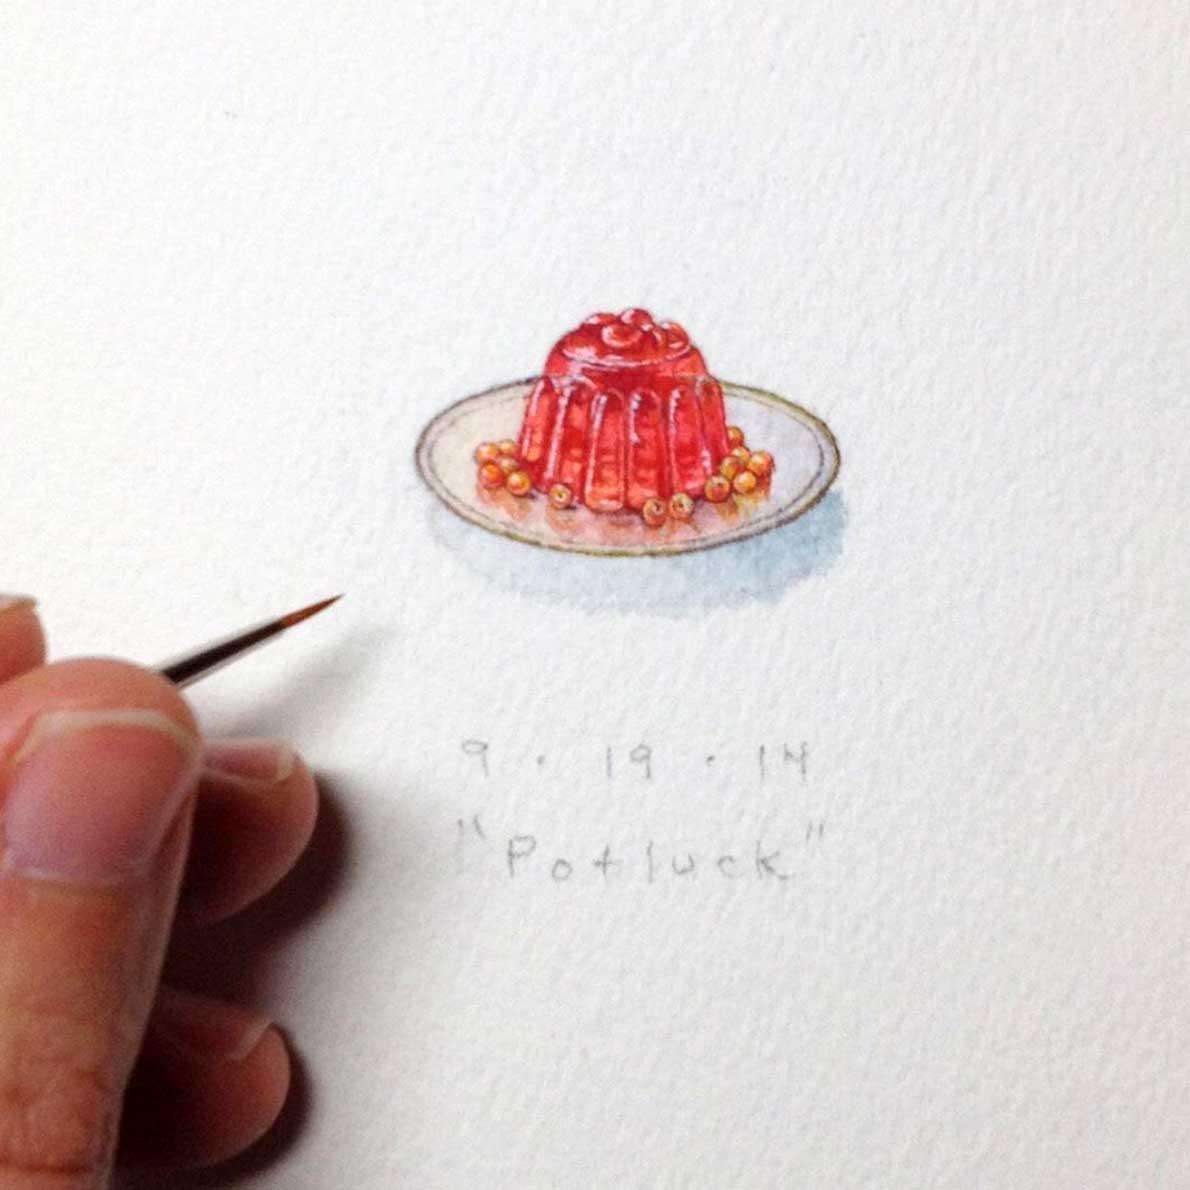 Miniatur-Gemälde von Brooke Rothshank Brooke-Rothshank-miniatur-malerei_12